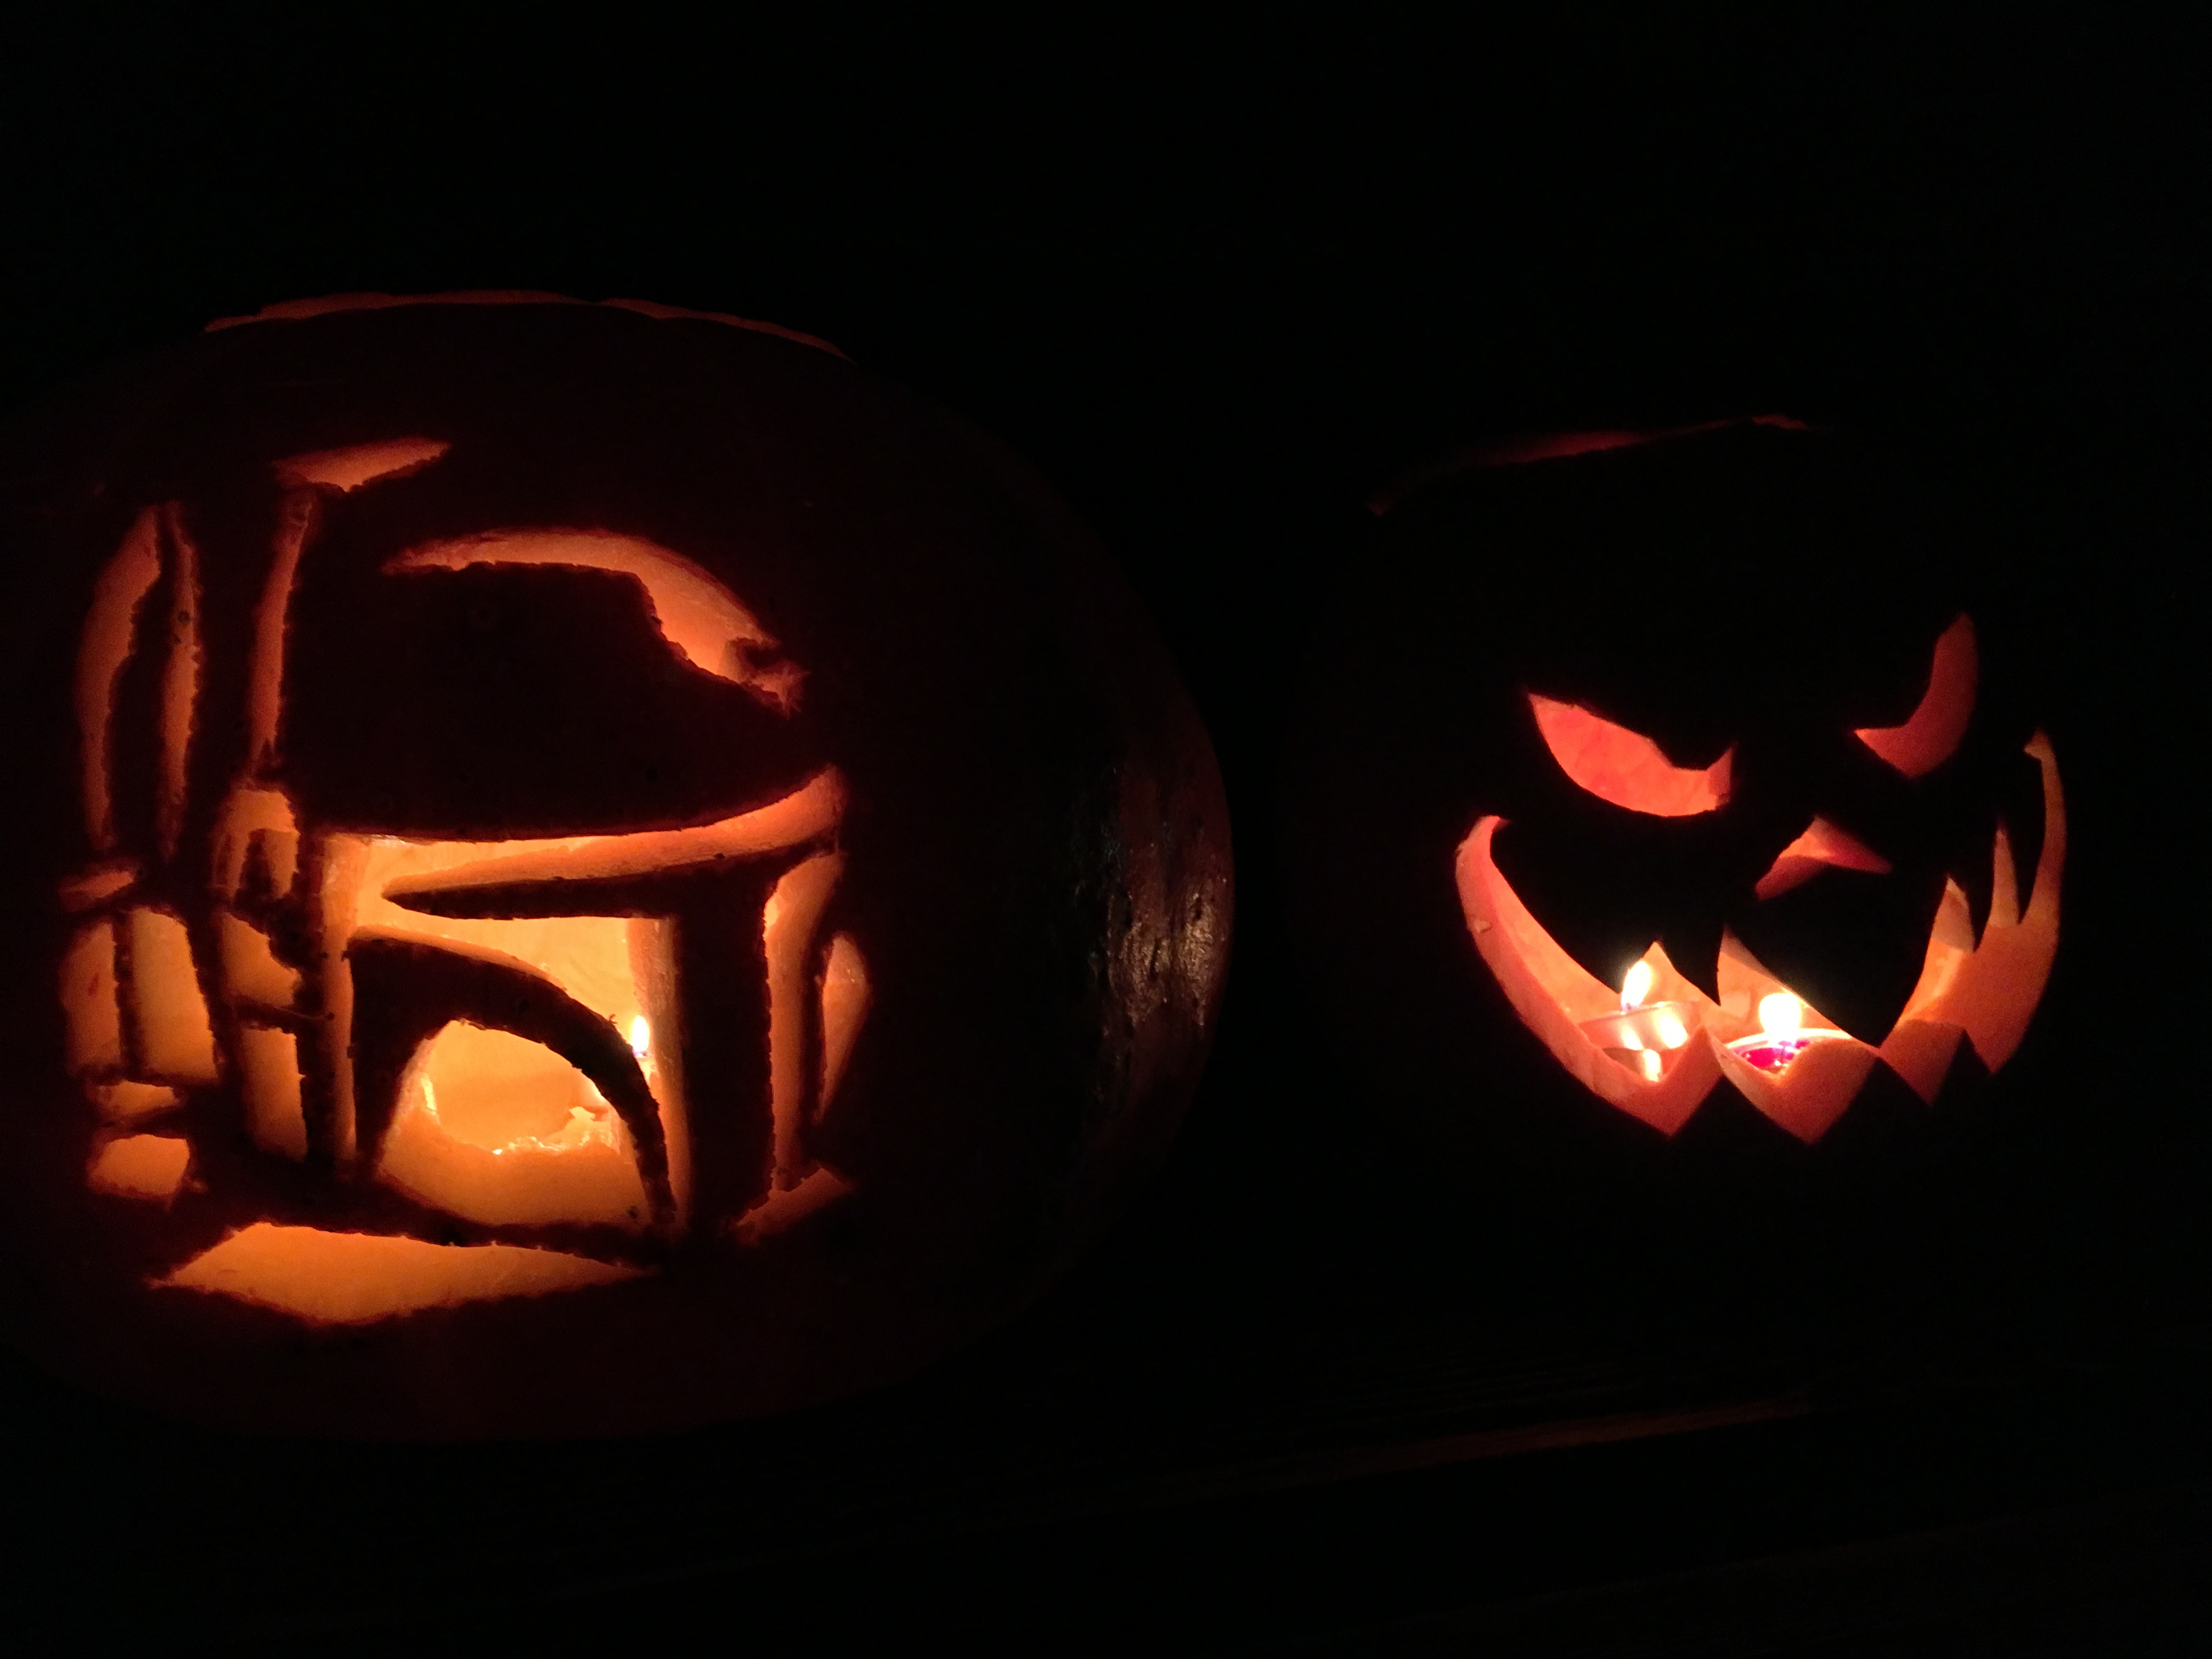 szmk_tok_pumpkin_boba_fett_star_wars_20.JPG